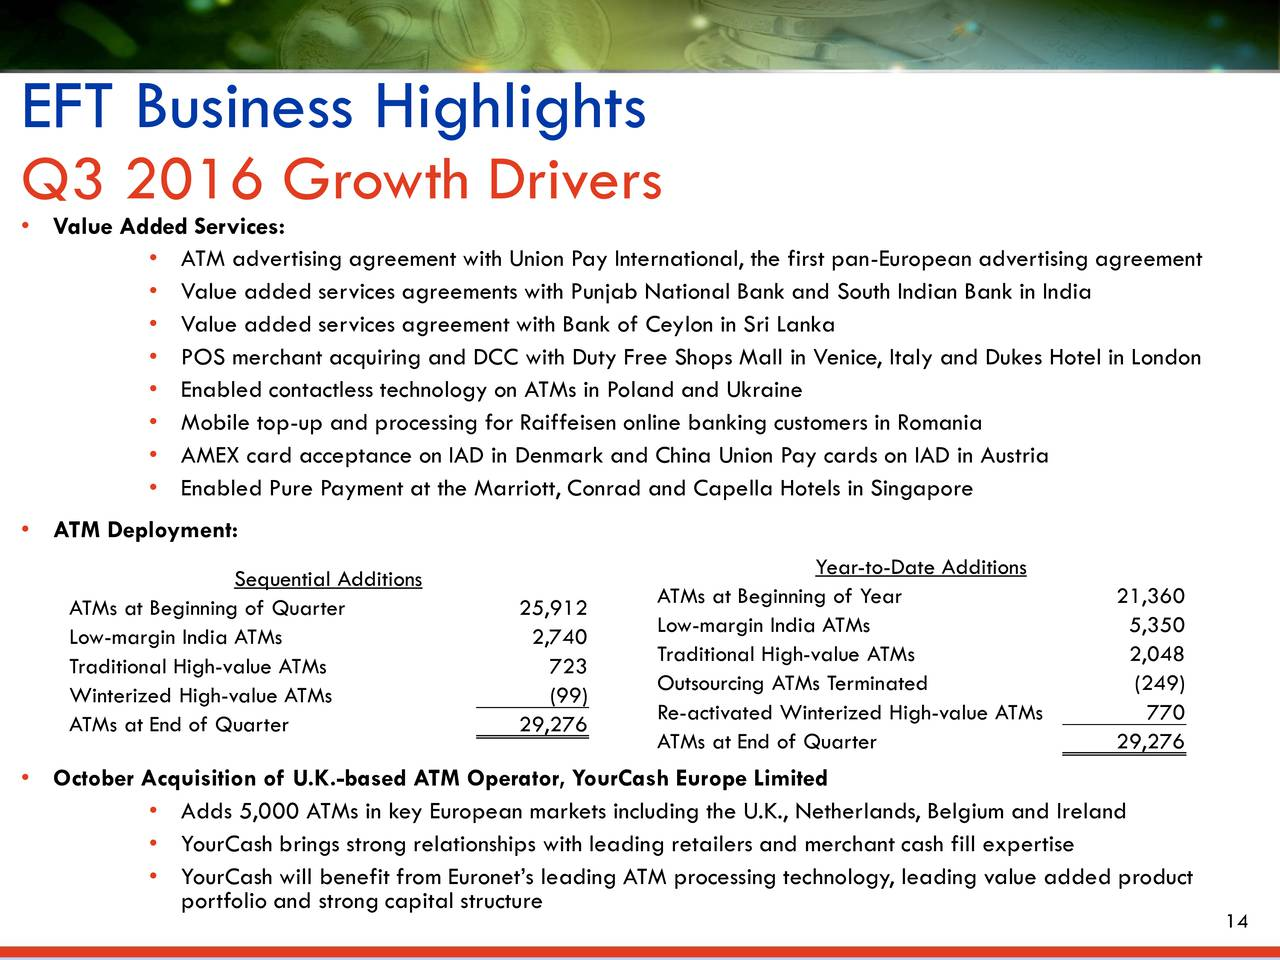 Earnings Disclaimer >> Euronet Worldwide, Inc. 2016 Q3 - Results - Earnings Call Slides - Euronet Worldwide, Inc ...